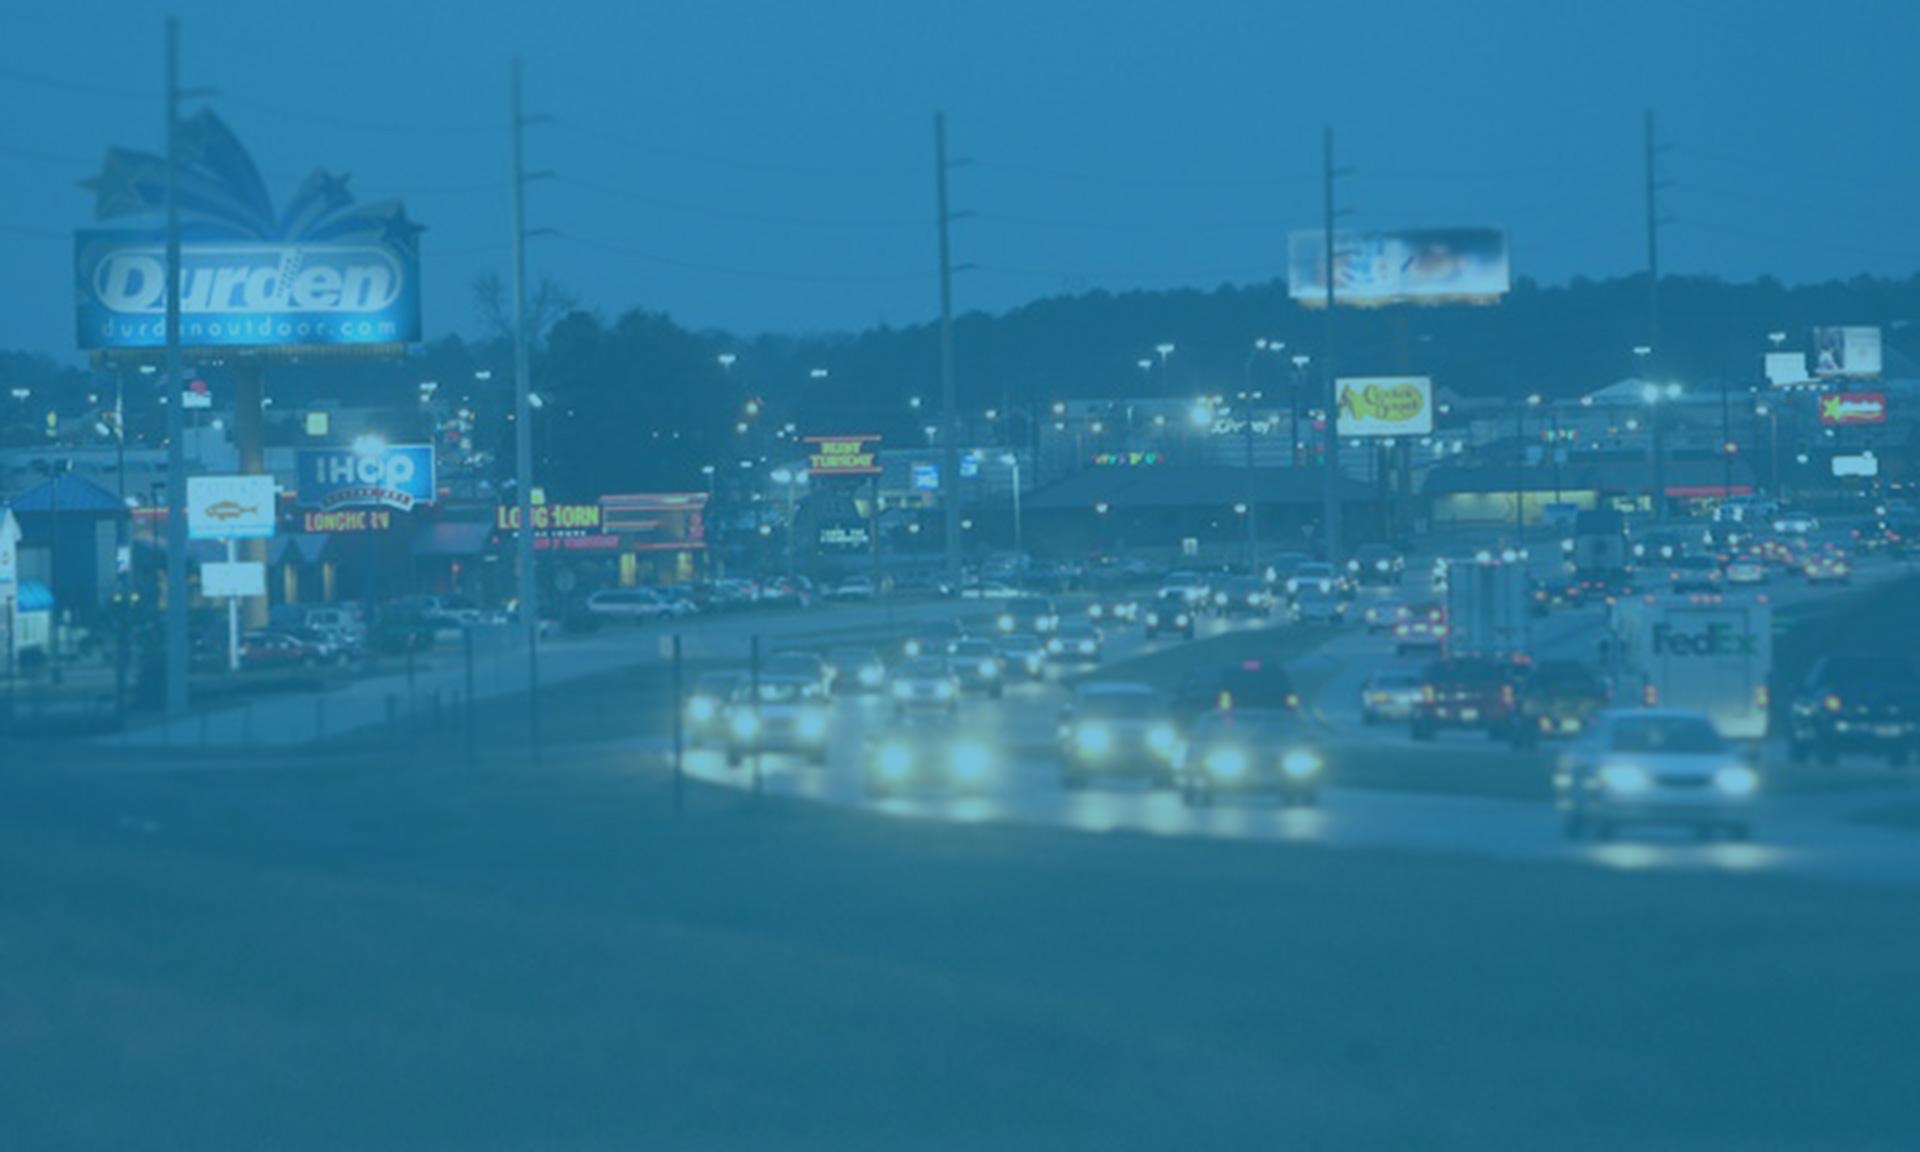 Durden-RCC-Billboard-Large-Overlay